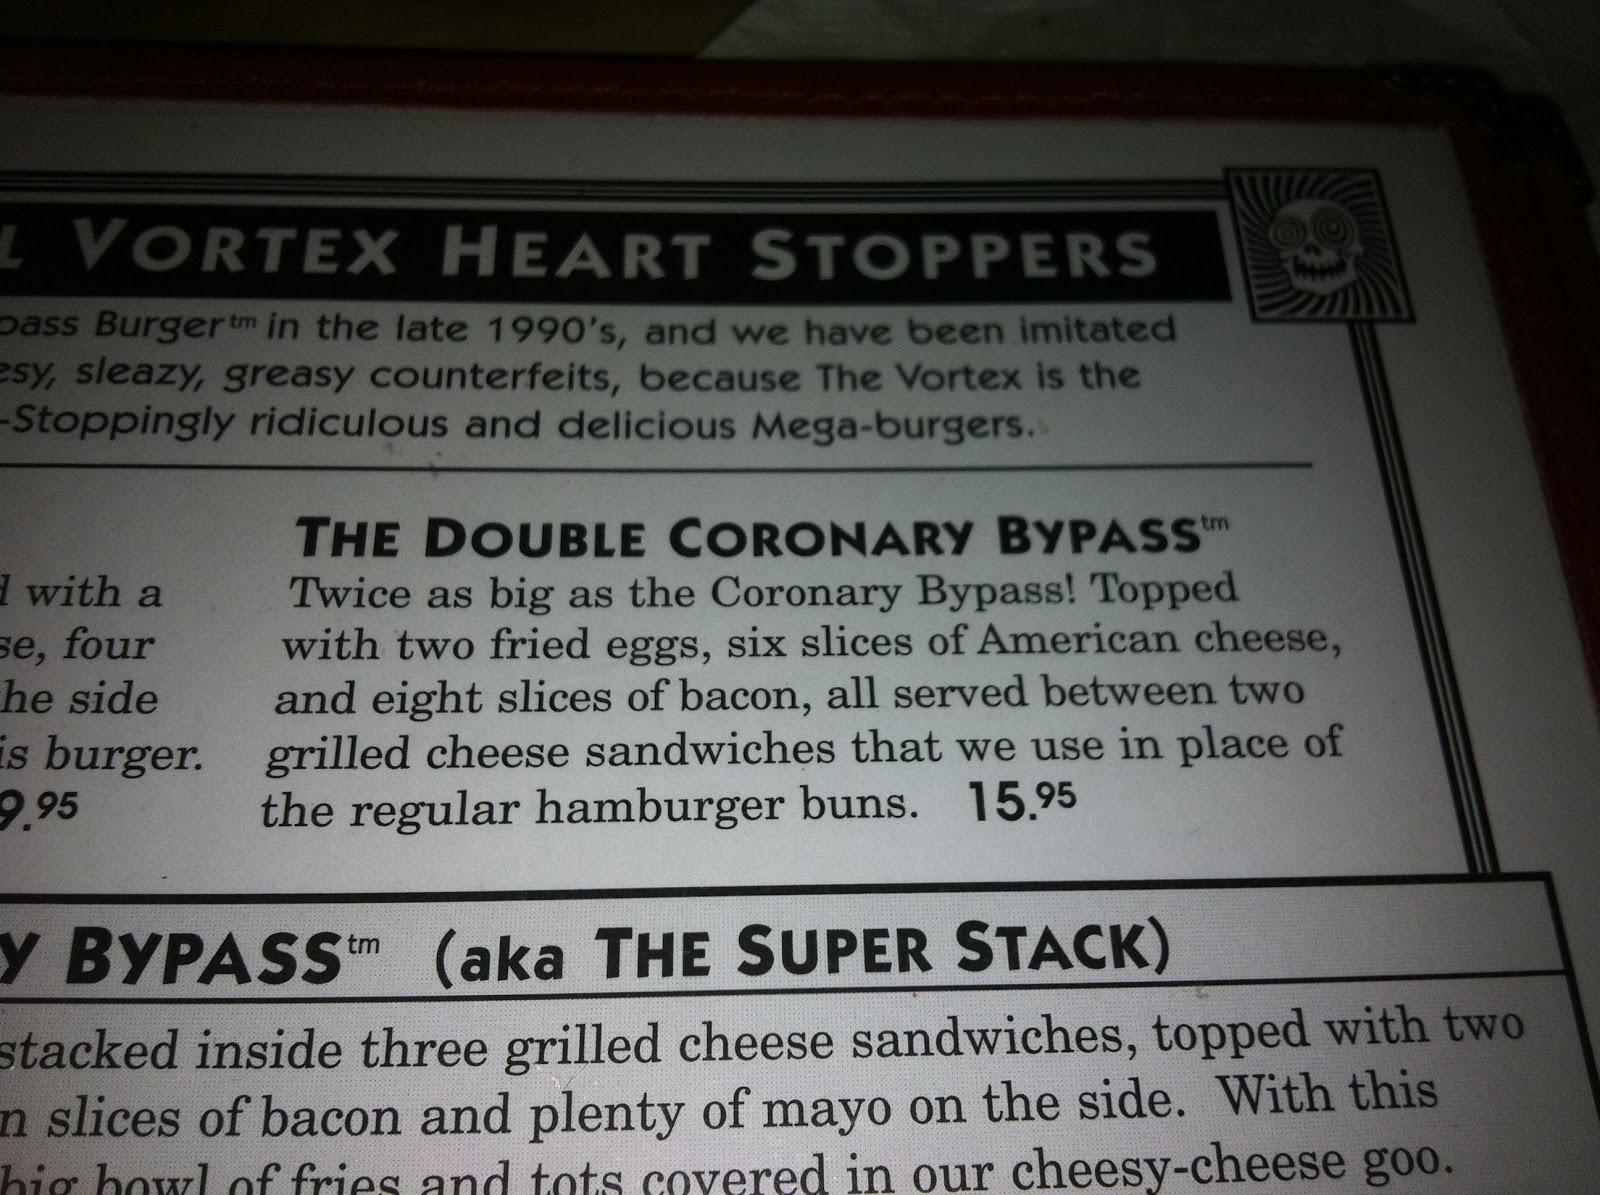 Canada Goose chilliwack parka online store - Burgers by the Beach: Vortex - Atlanta, GA